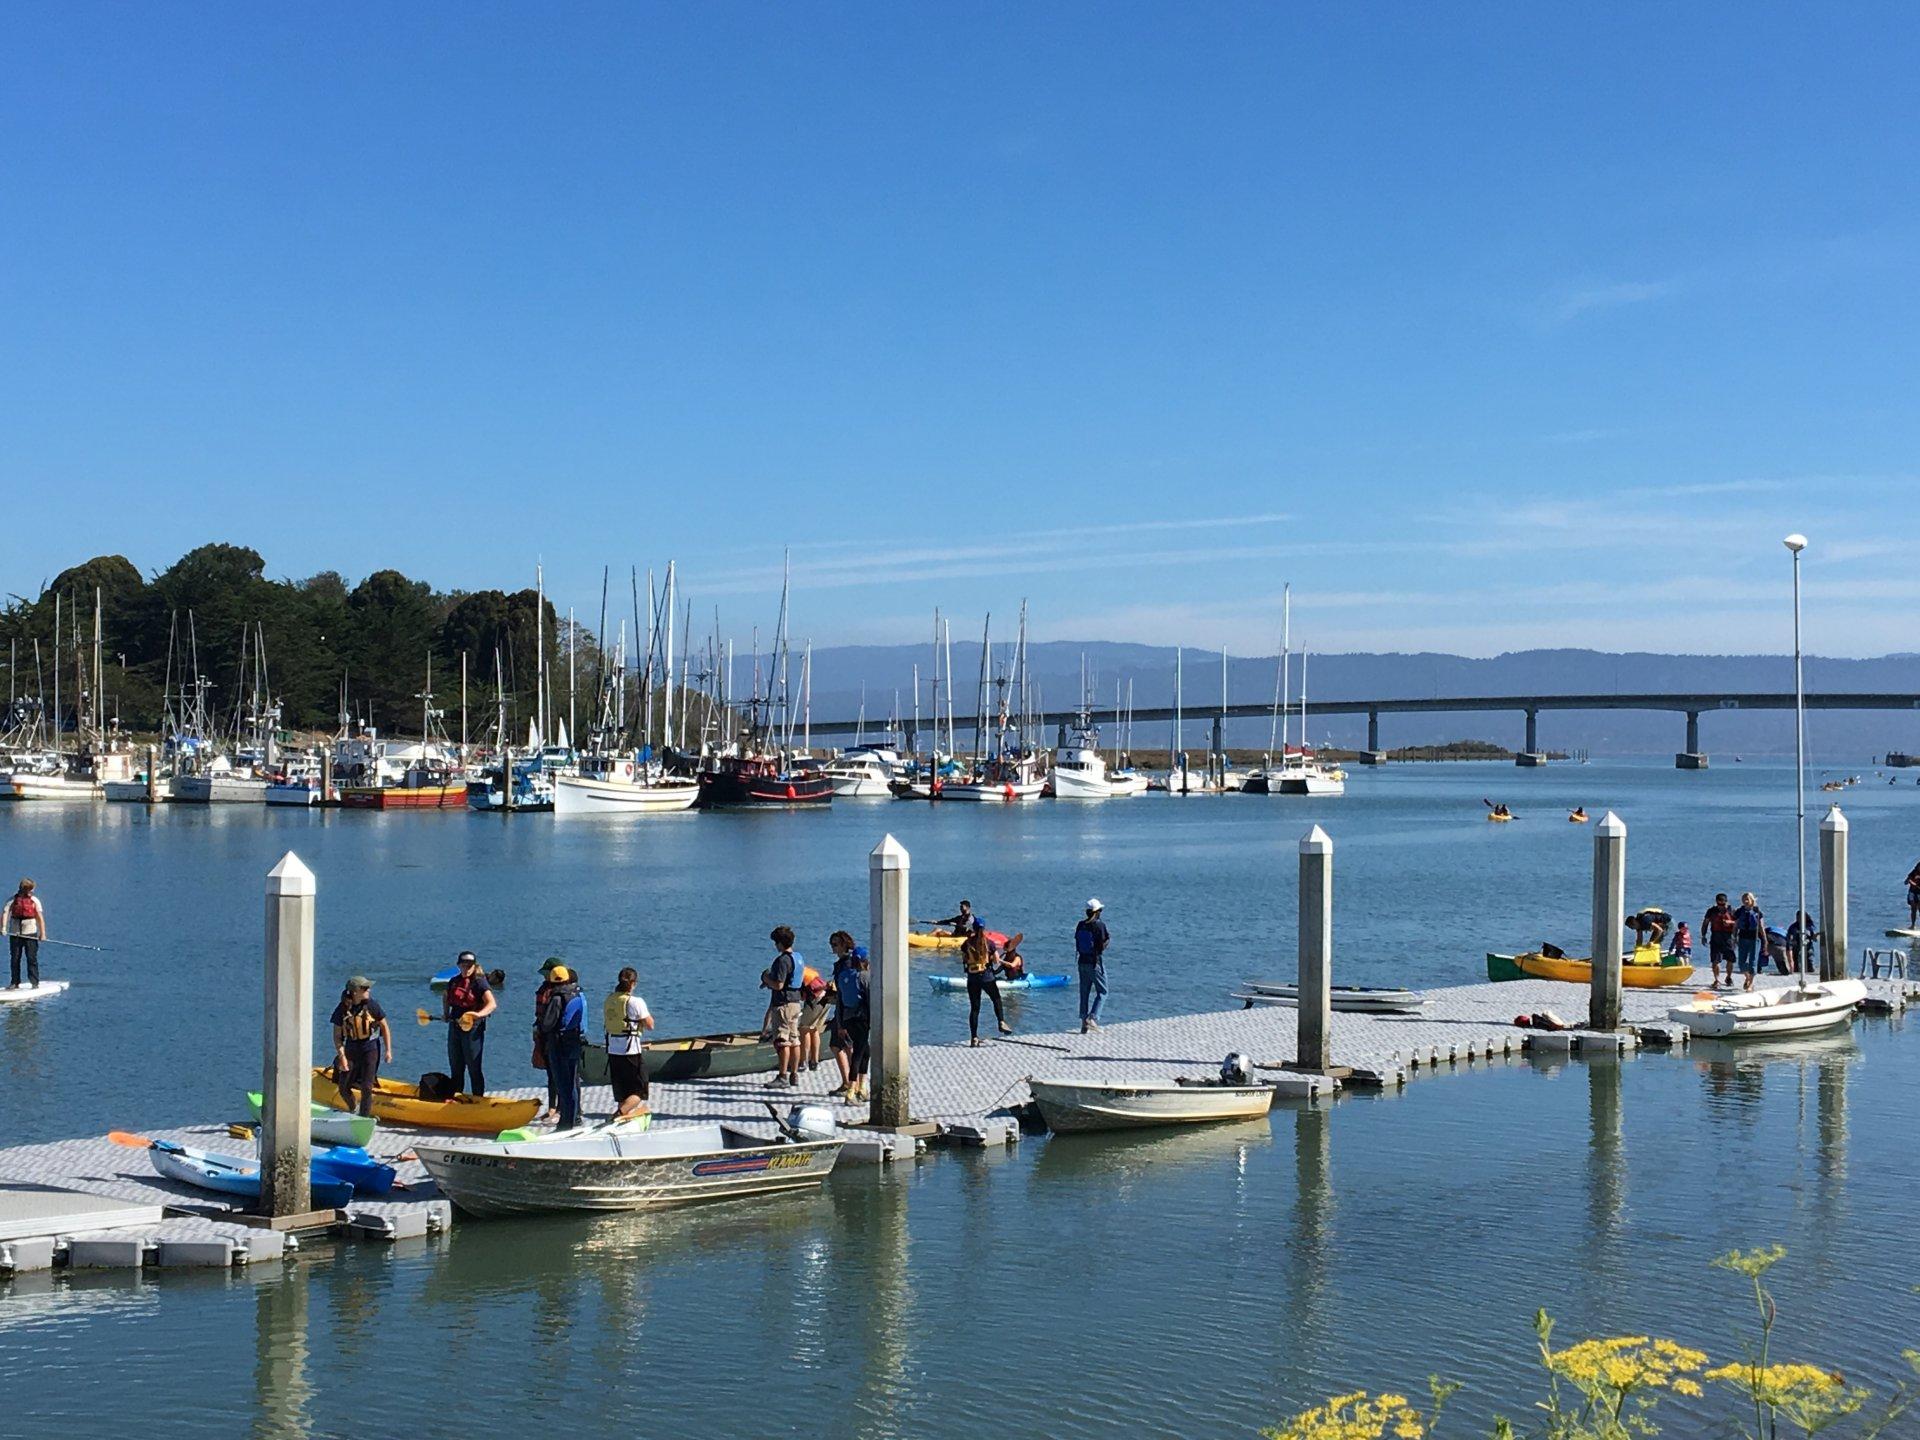 Students coming back to the dock. Photo credit: Charlotte Rutigliano